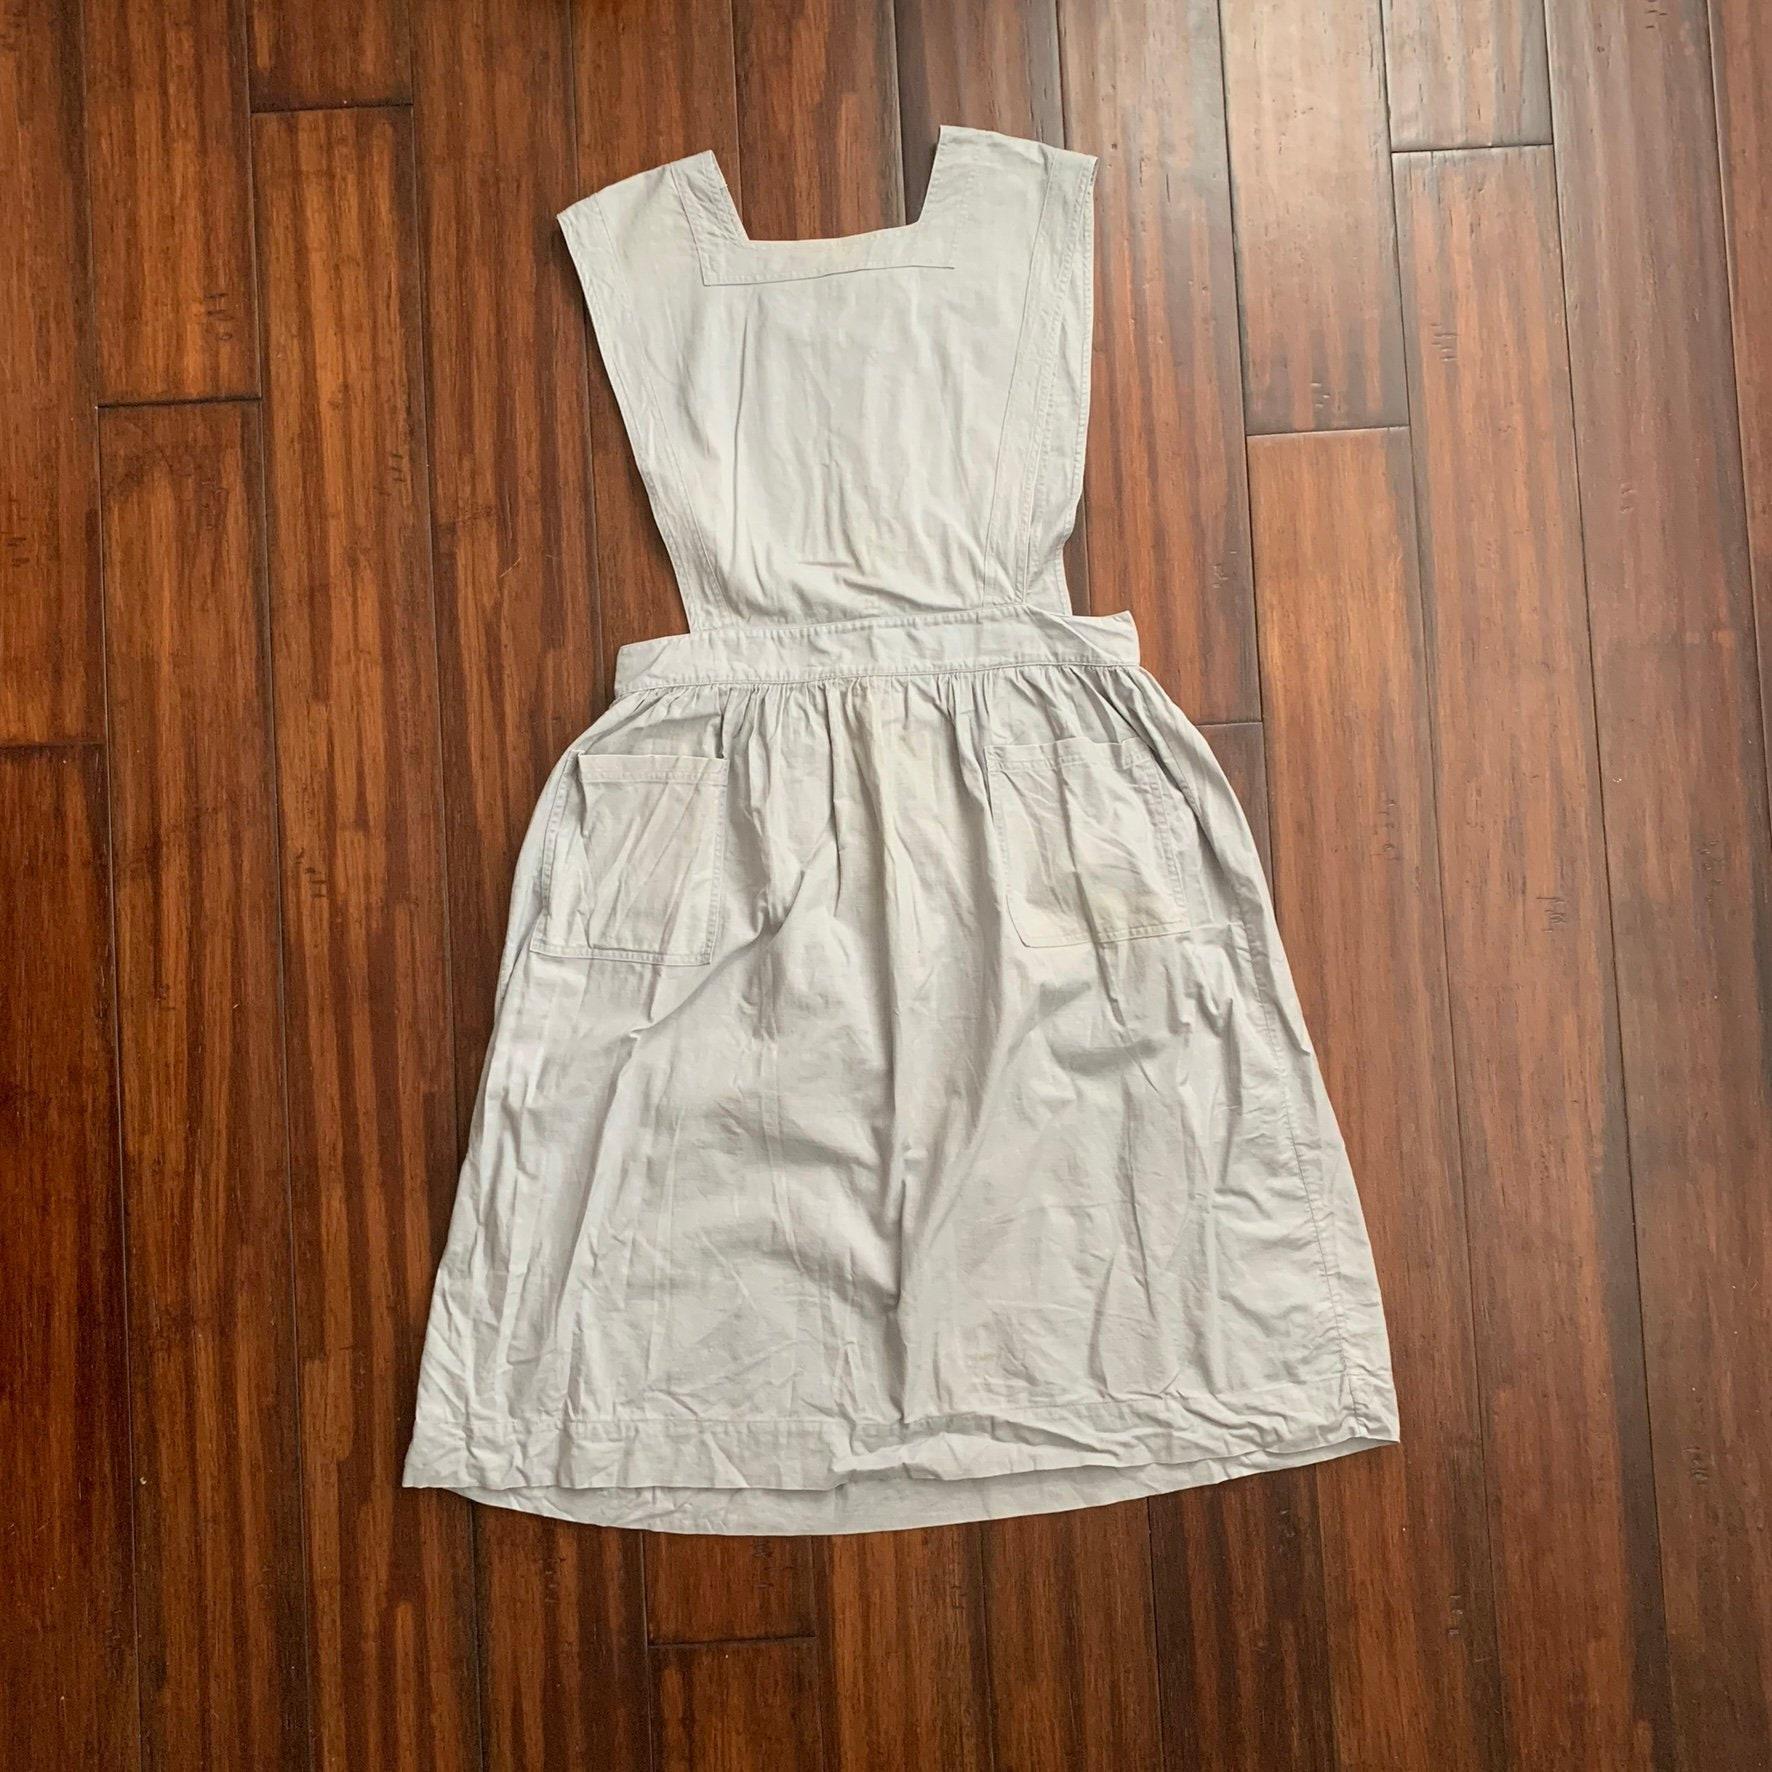 Vintage Aprons, Retro Aprons, Old Fashioned Aprons & Patterns 1950s Vintage Ottenheimer Cotton Twill Apron Coverall Dress $194.40 AT vintagedancer.com